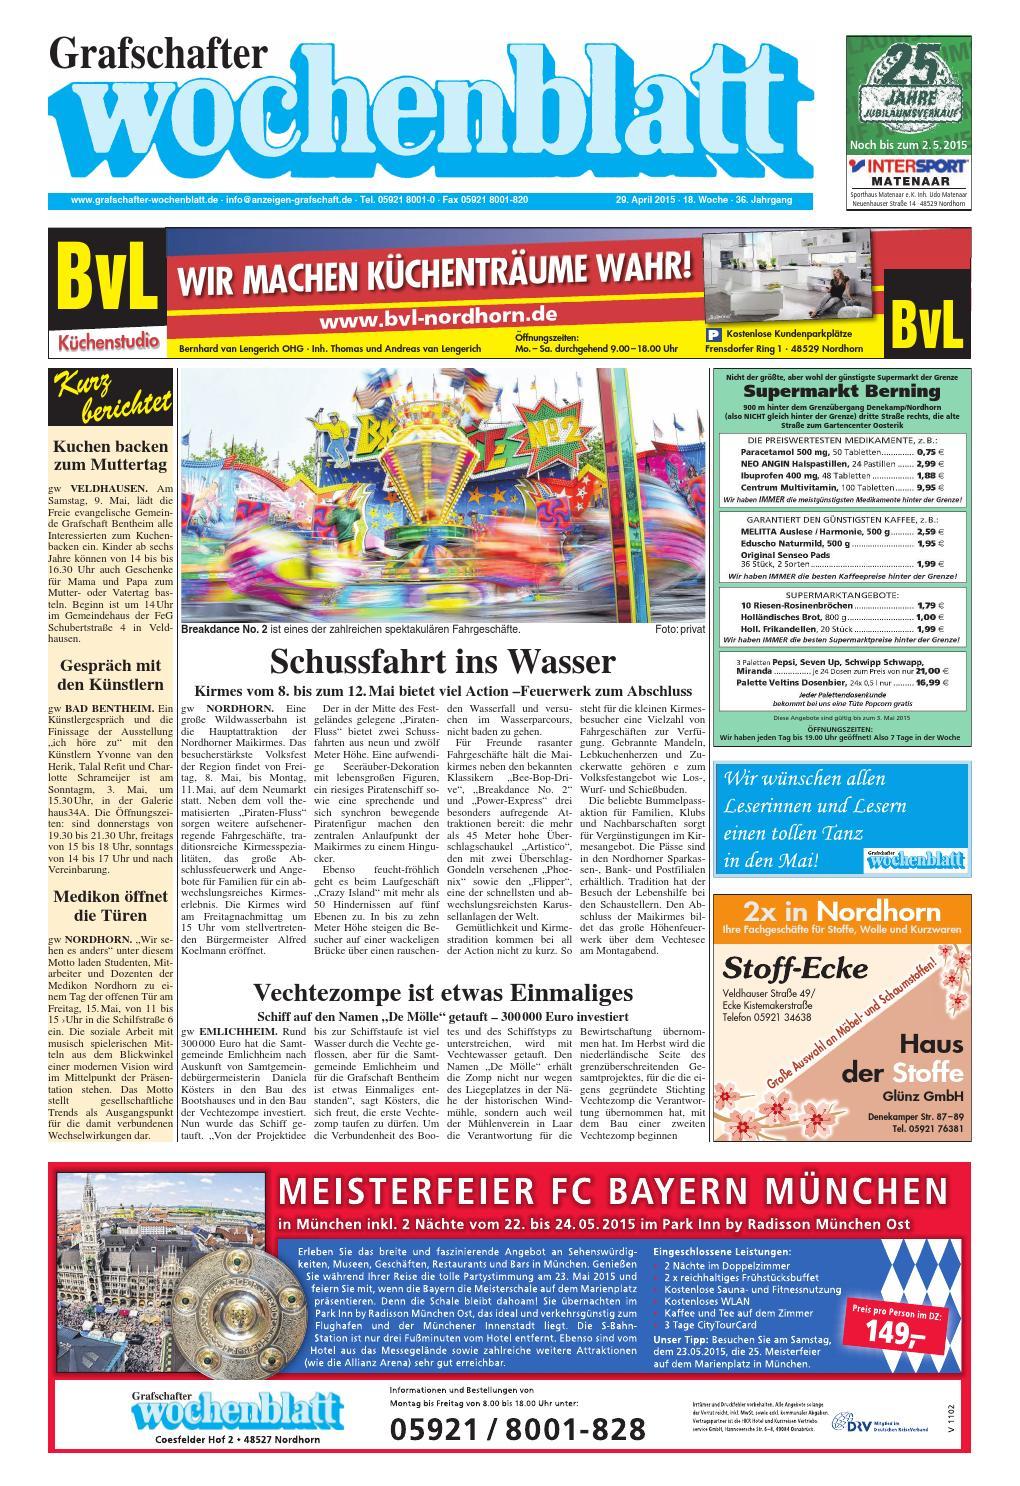 grafschafter wochenblatt 29 by sonntagszeitung issuu. Black Bedroom Furniture Sets. Home Design Ideas